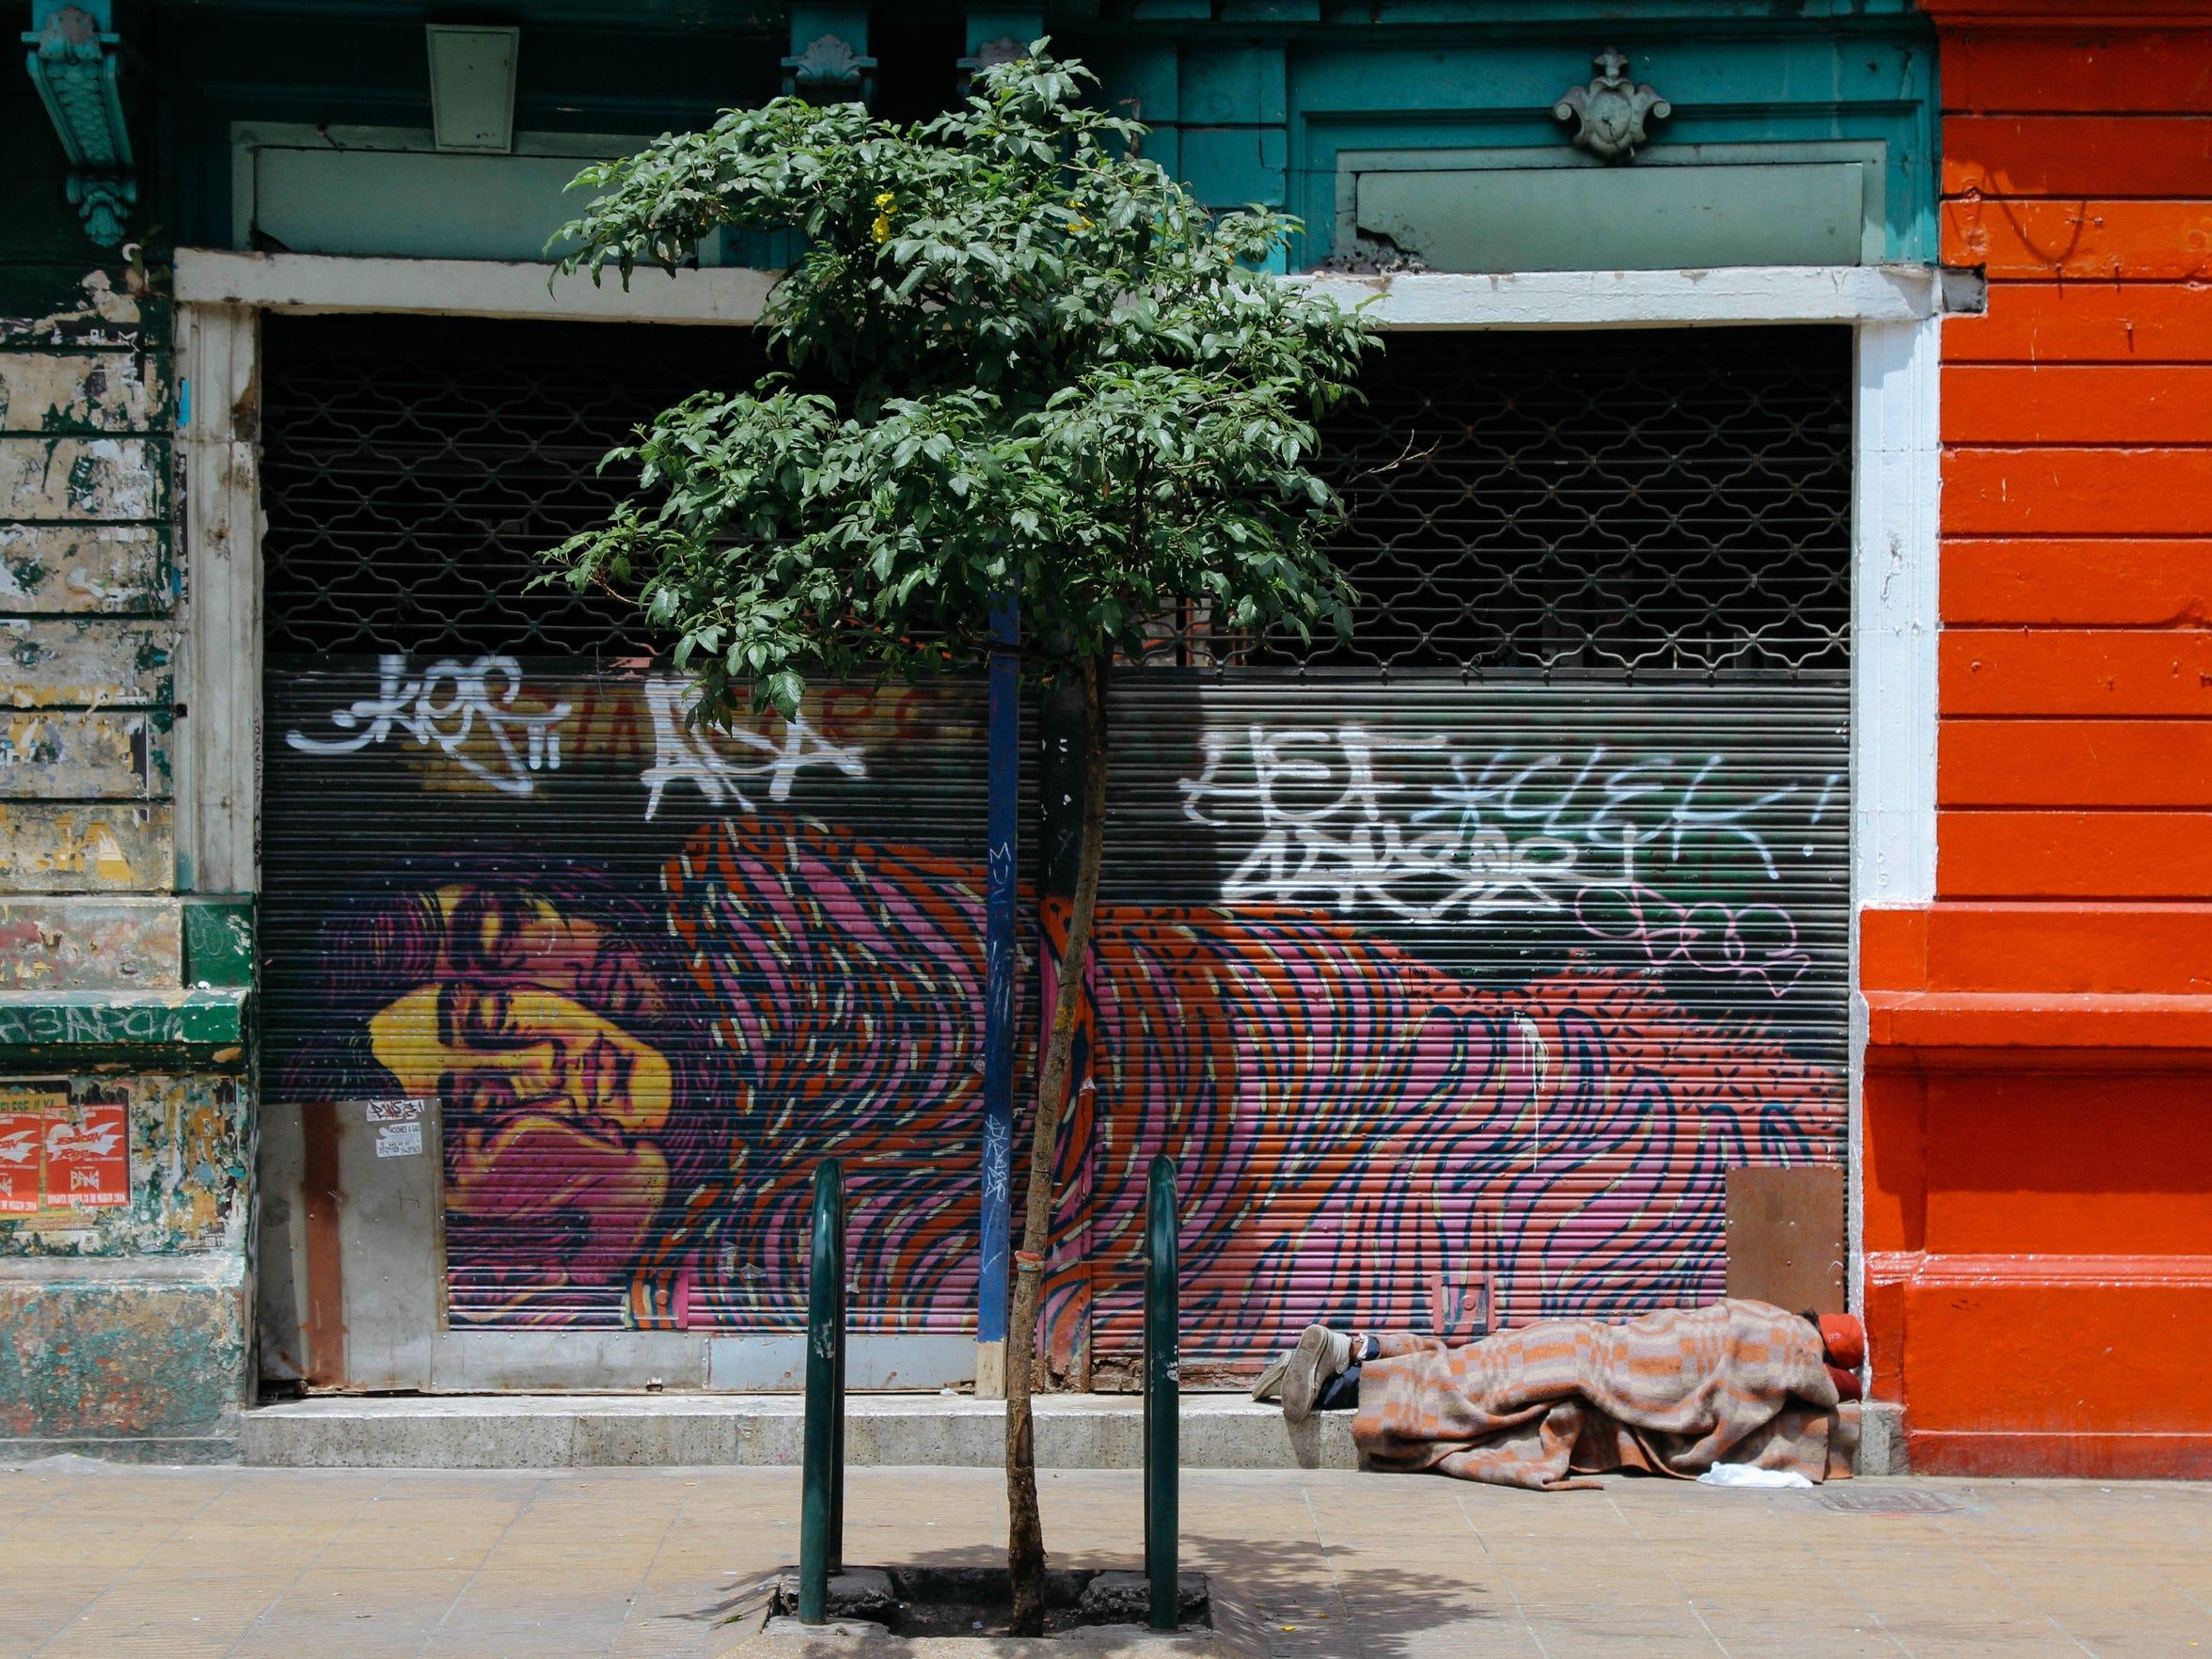 A man sleeps beneath a Bastardilla piece along Bogotá's